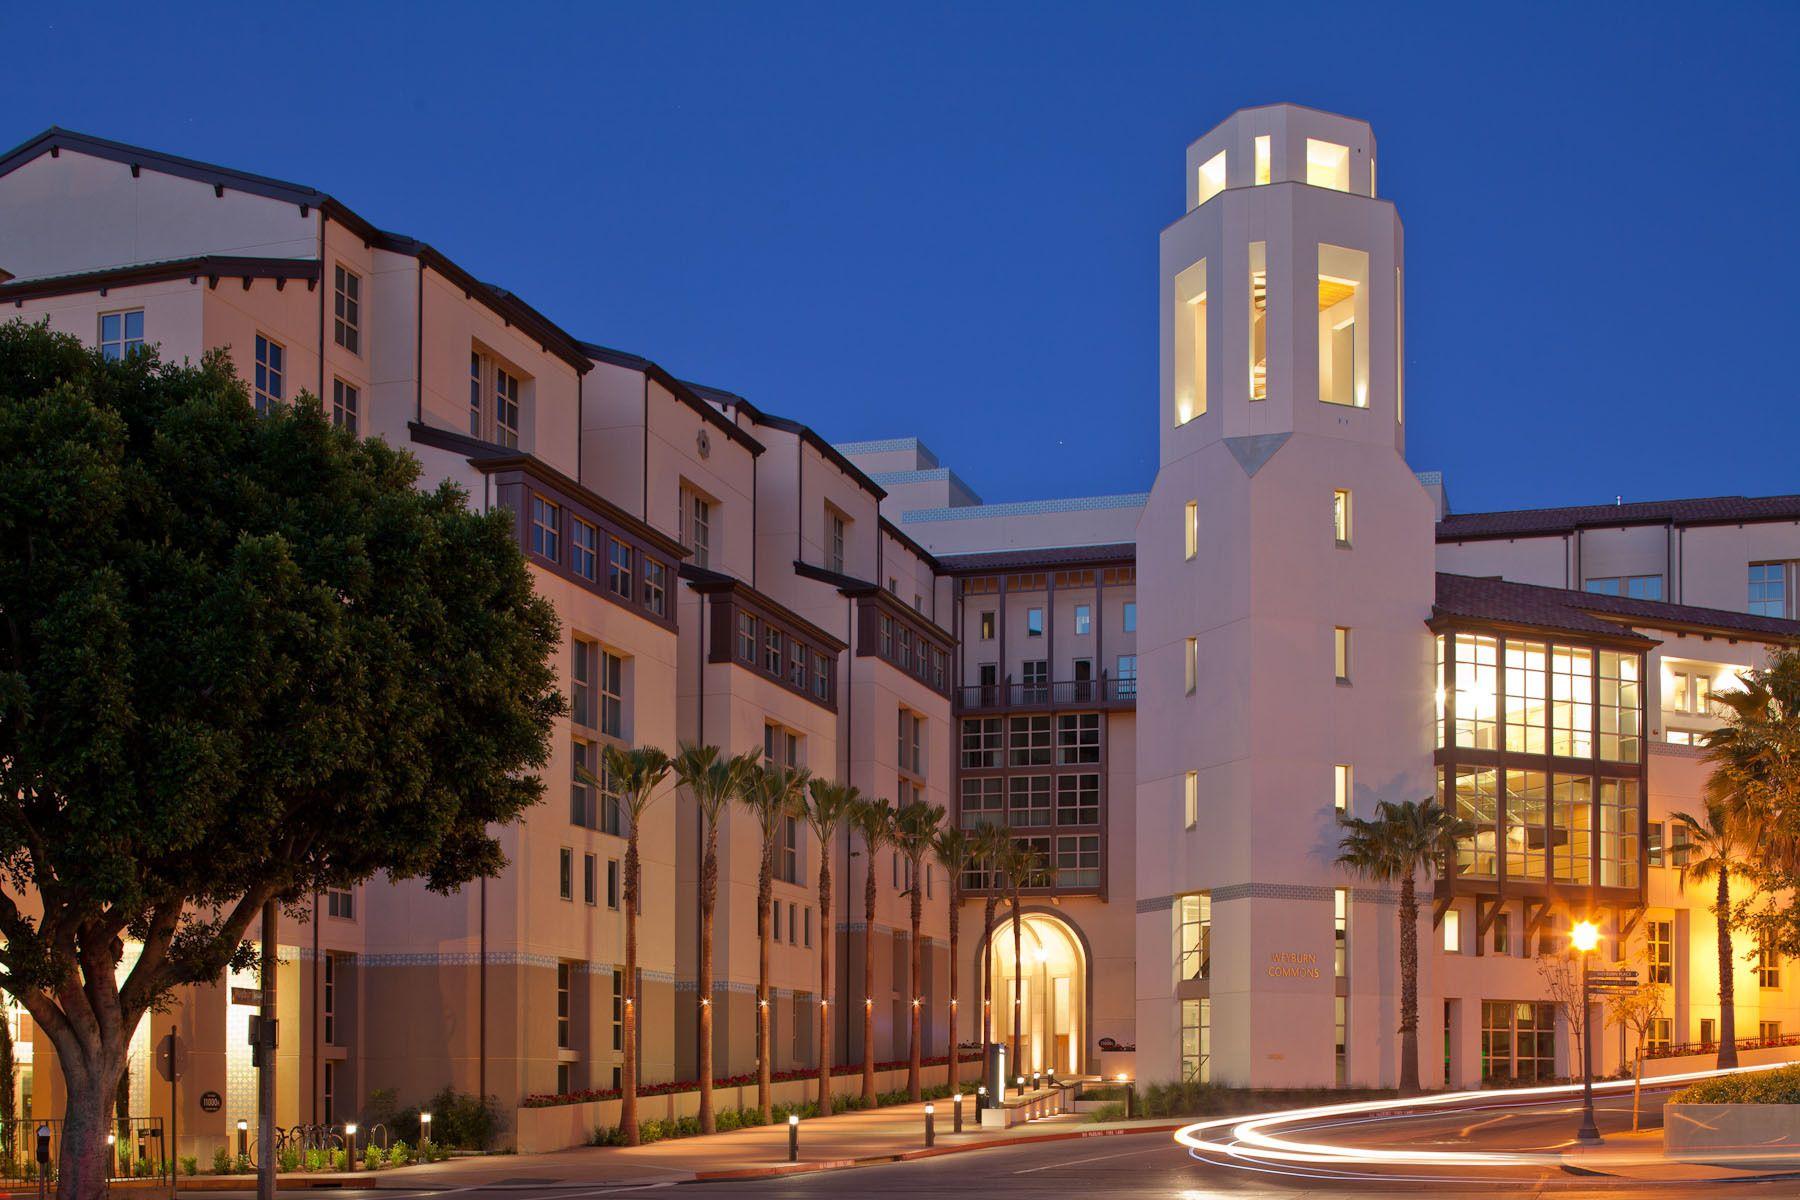 Weyburn Terrace Graduate Housing at UCLA